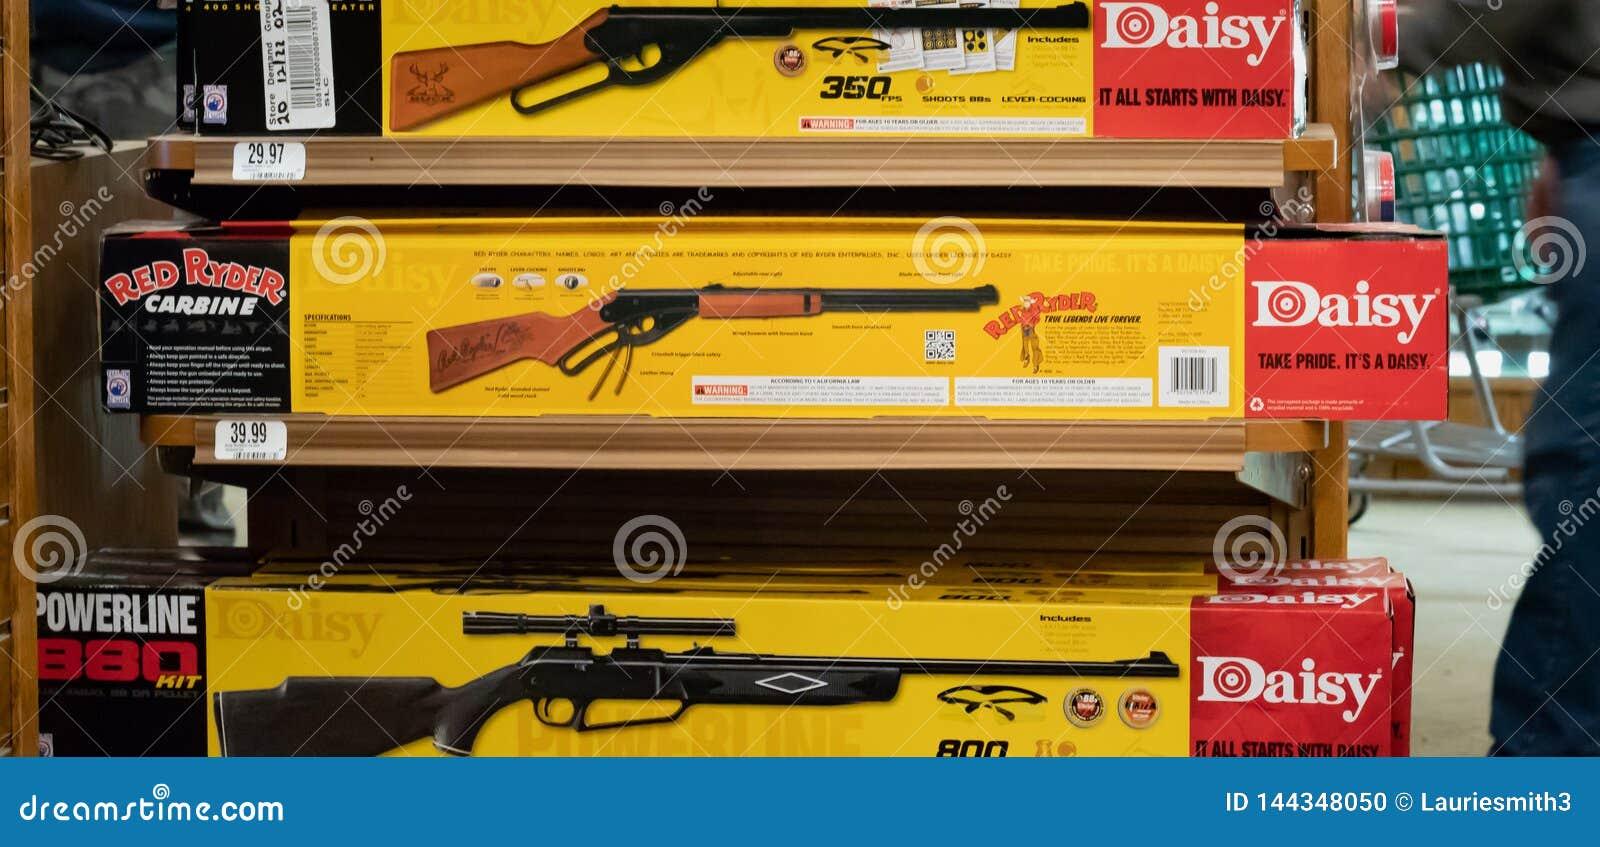 Red Ryder BB Gun / Editorial Illustrative